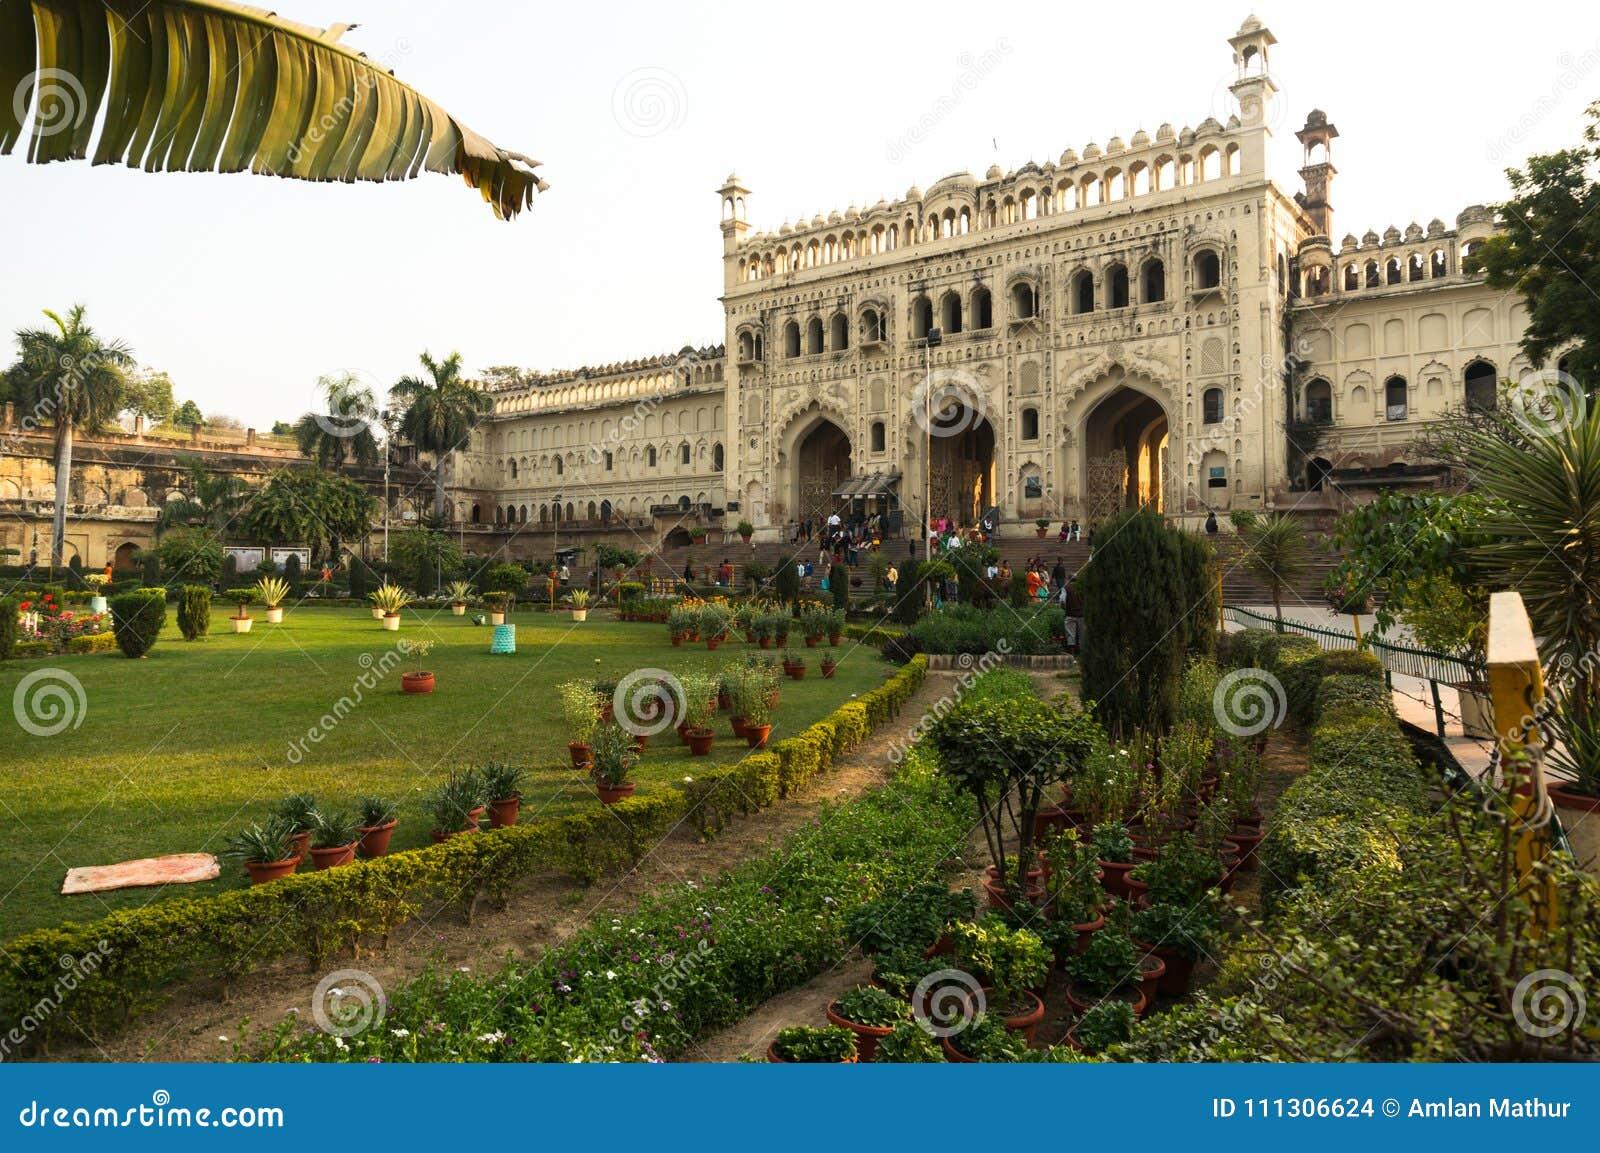 Estasi il portone ed i giardini a Bara Imambara lucknow India